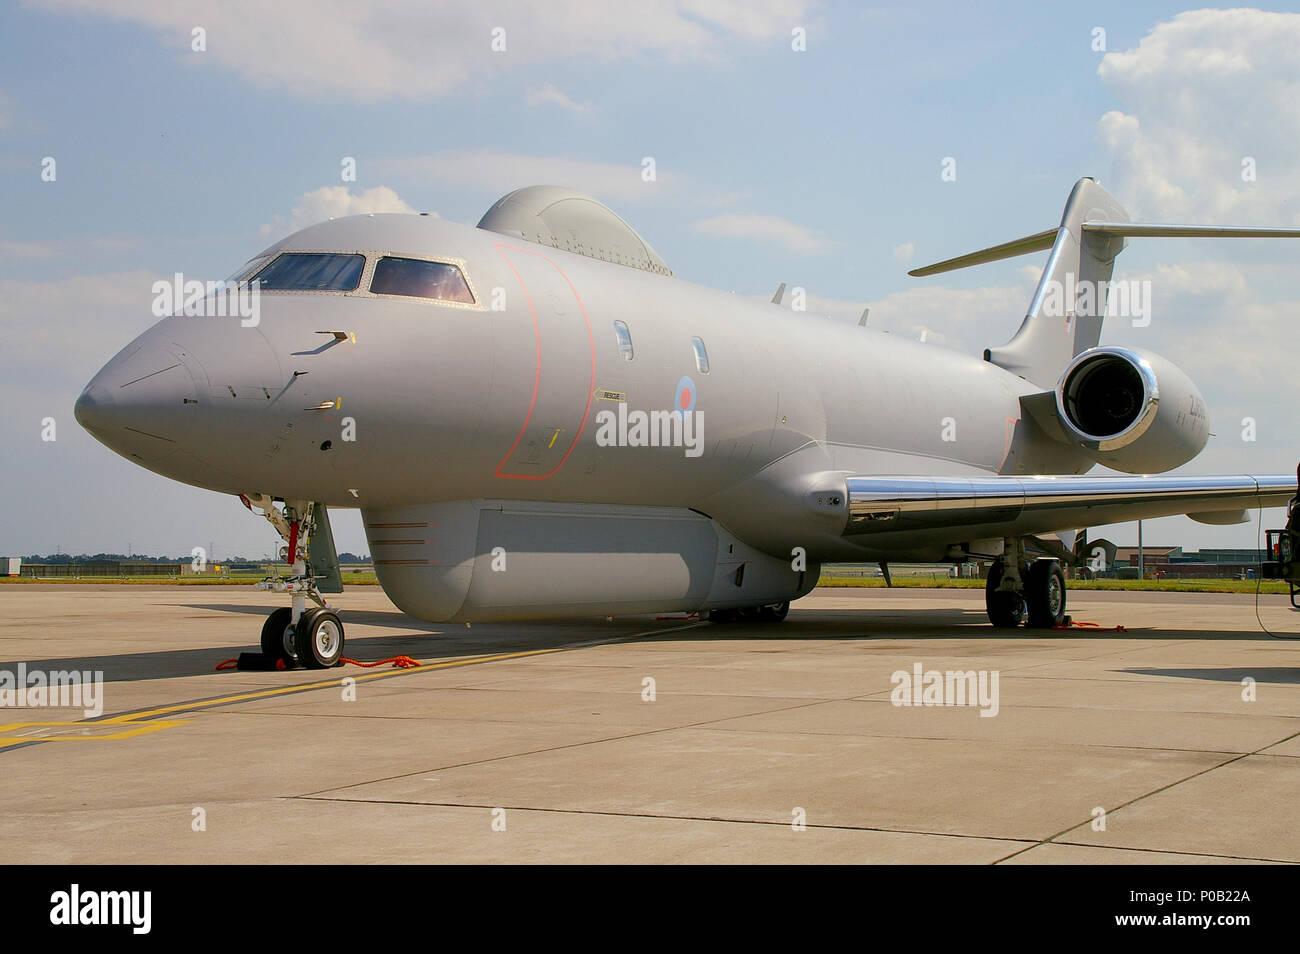 royal-air-force-raf-r1-sentinel-zj692-an-airborne-battlefield-and-ground-surveillance-aircraft-raytheon-sentinel-based-on-bombardier-global-express-P0B22A.jpg